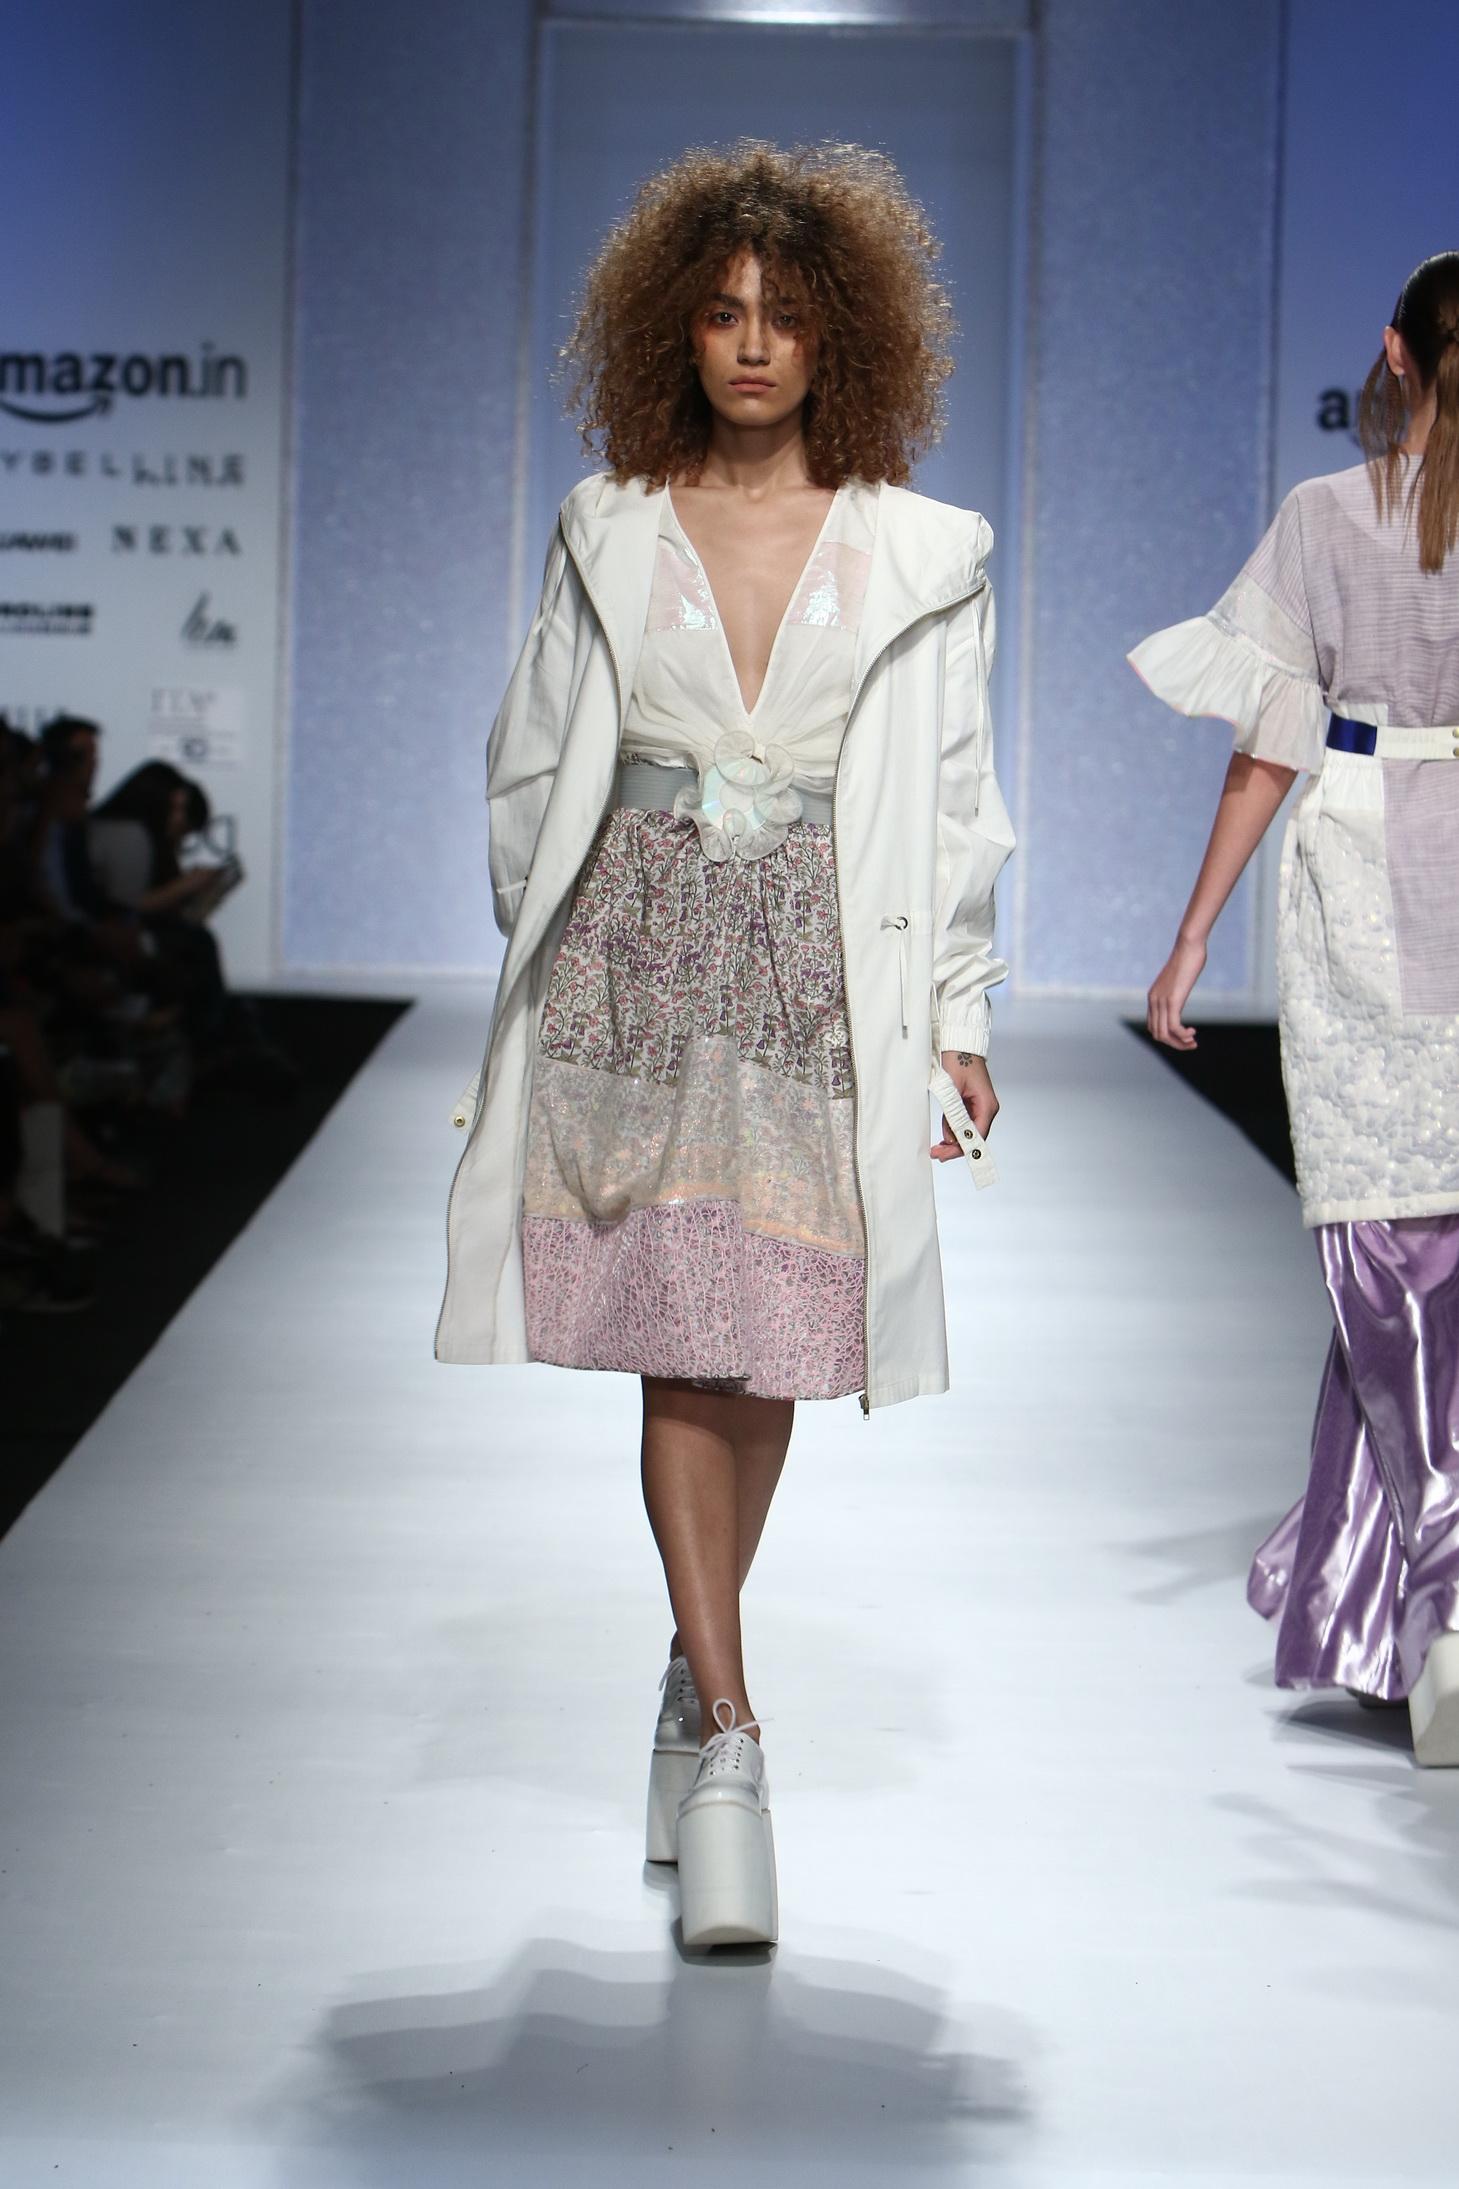 AM IT Amit Aggarwal - Amazon India Fashion Week SS17